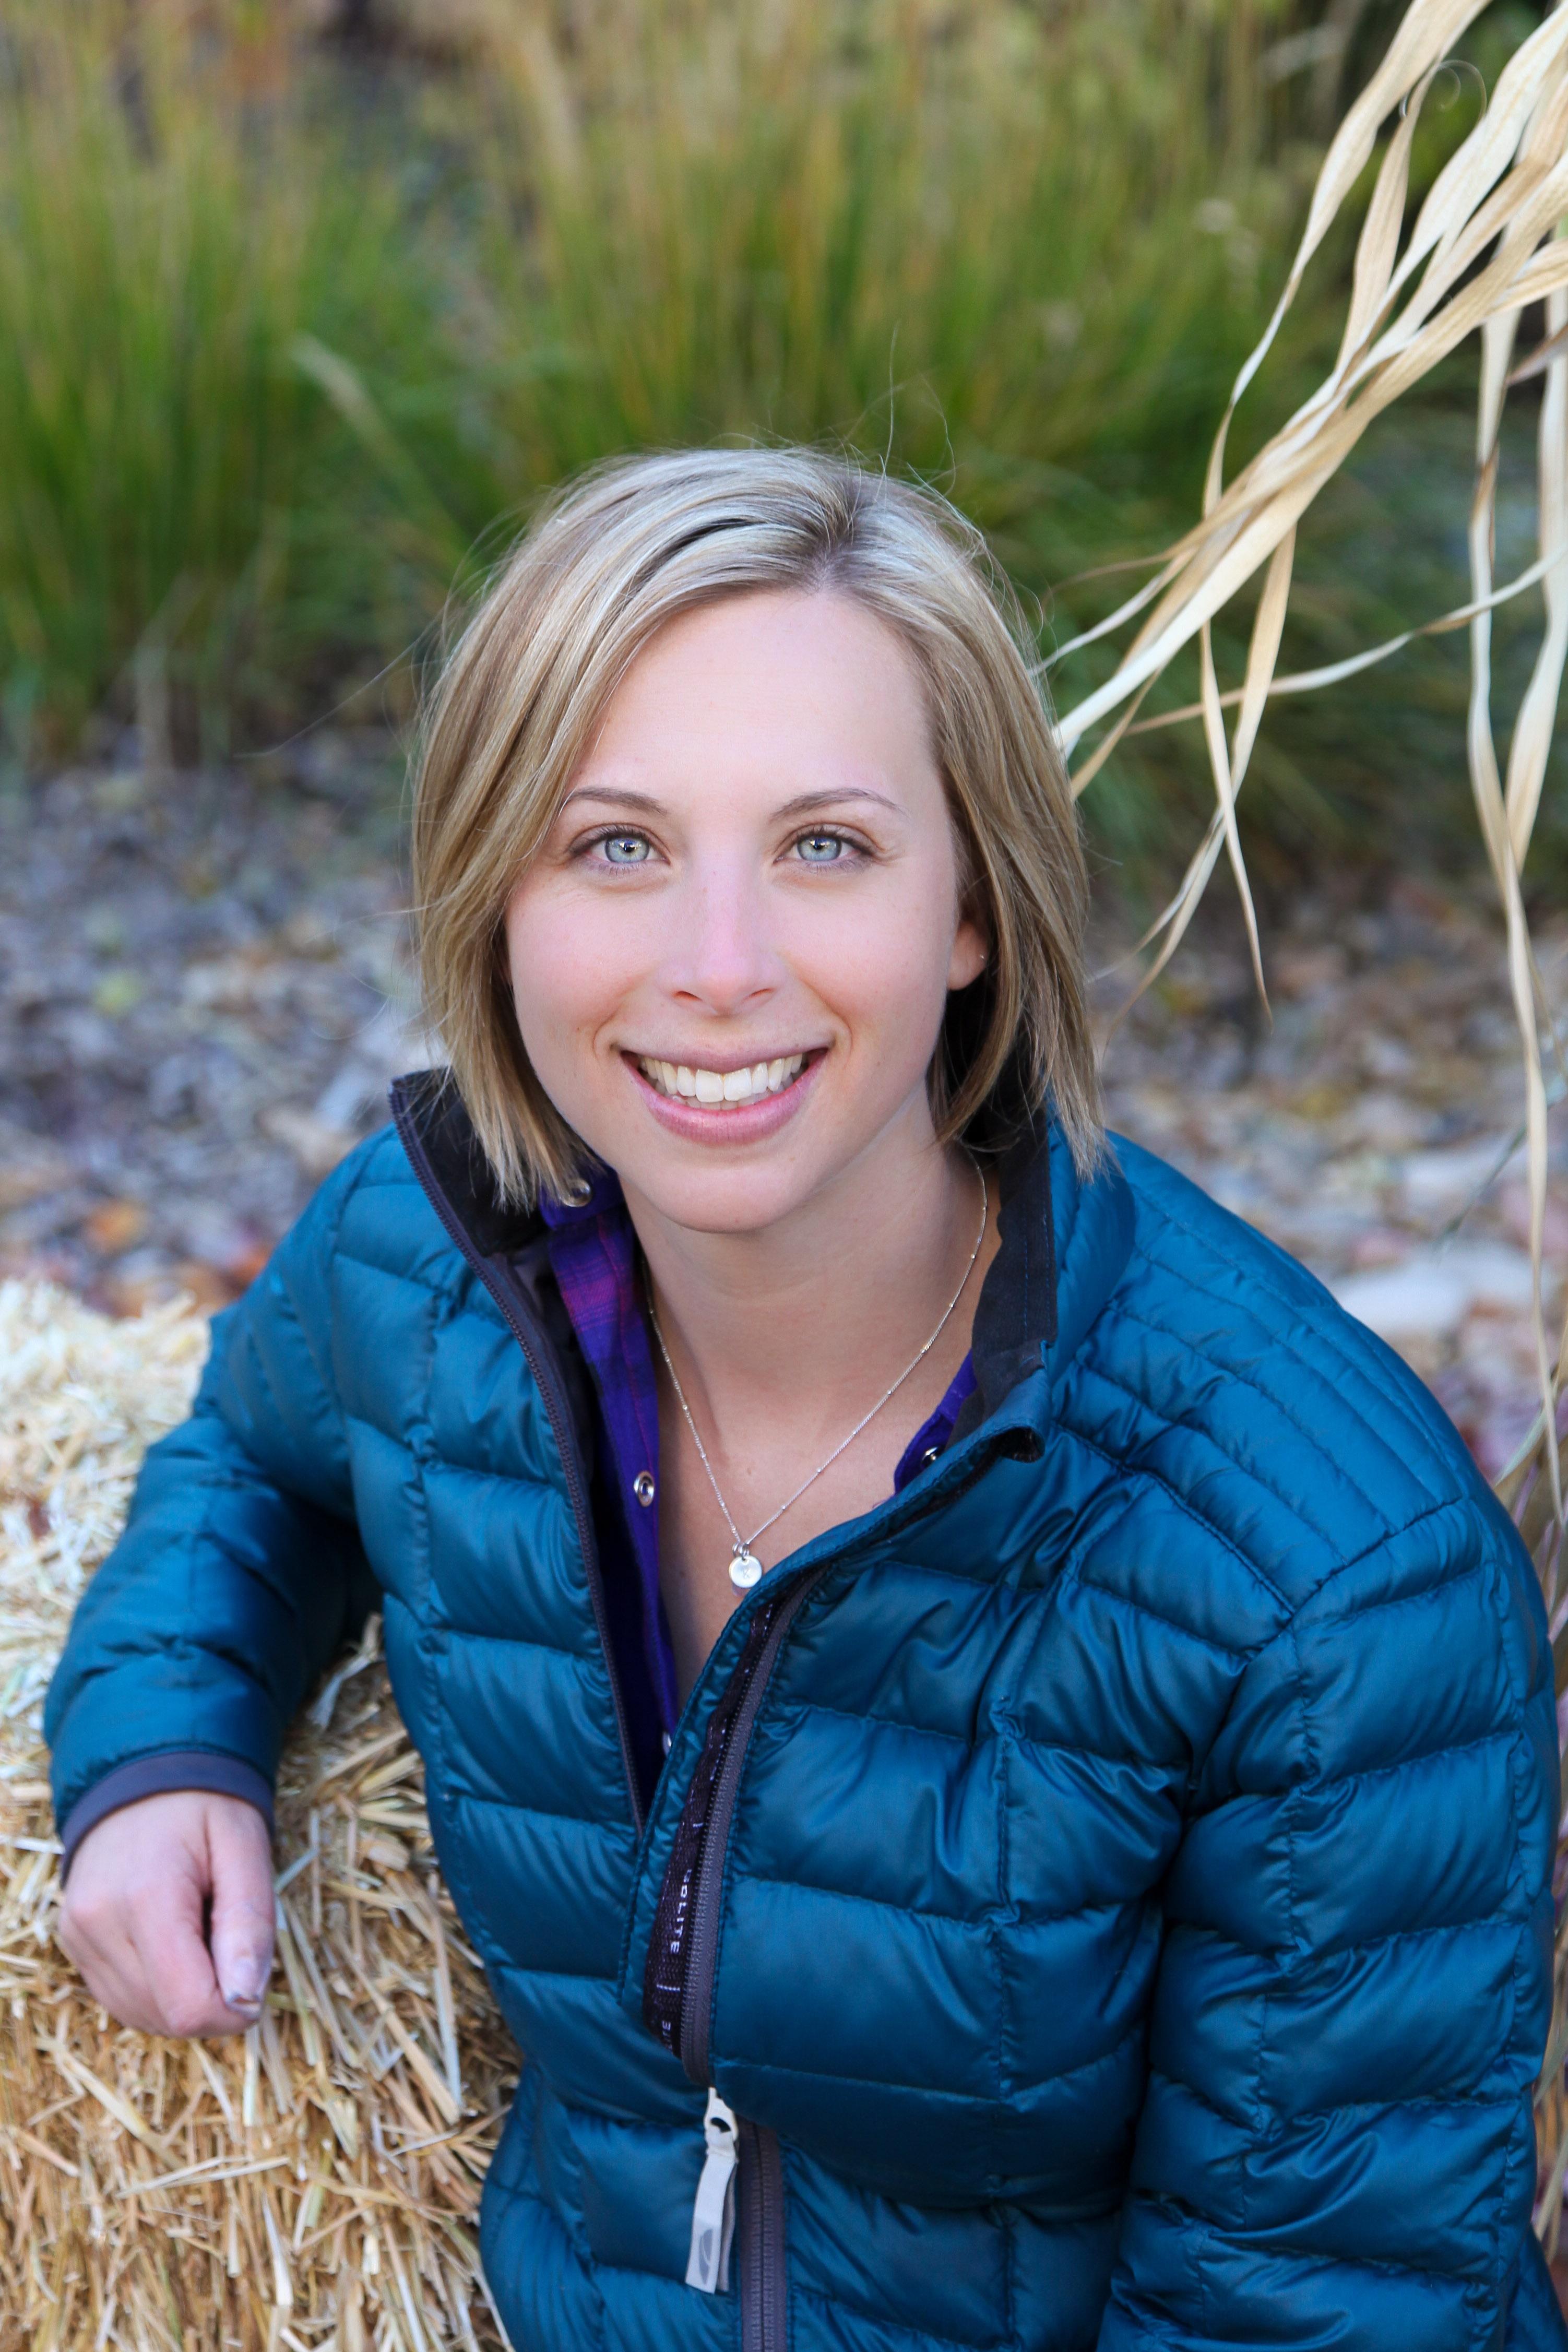 Katie Fox, Esq. Vice President